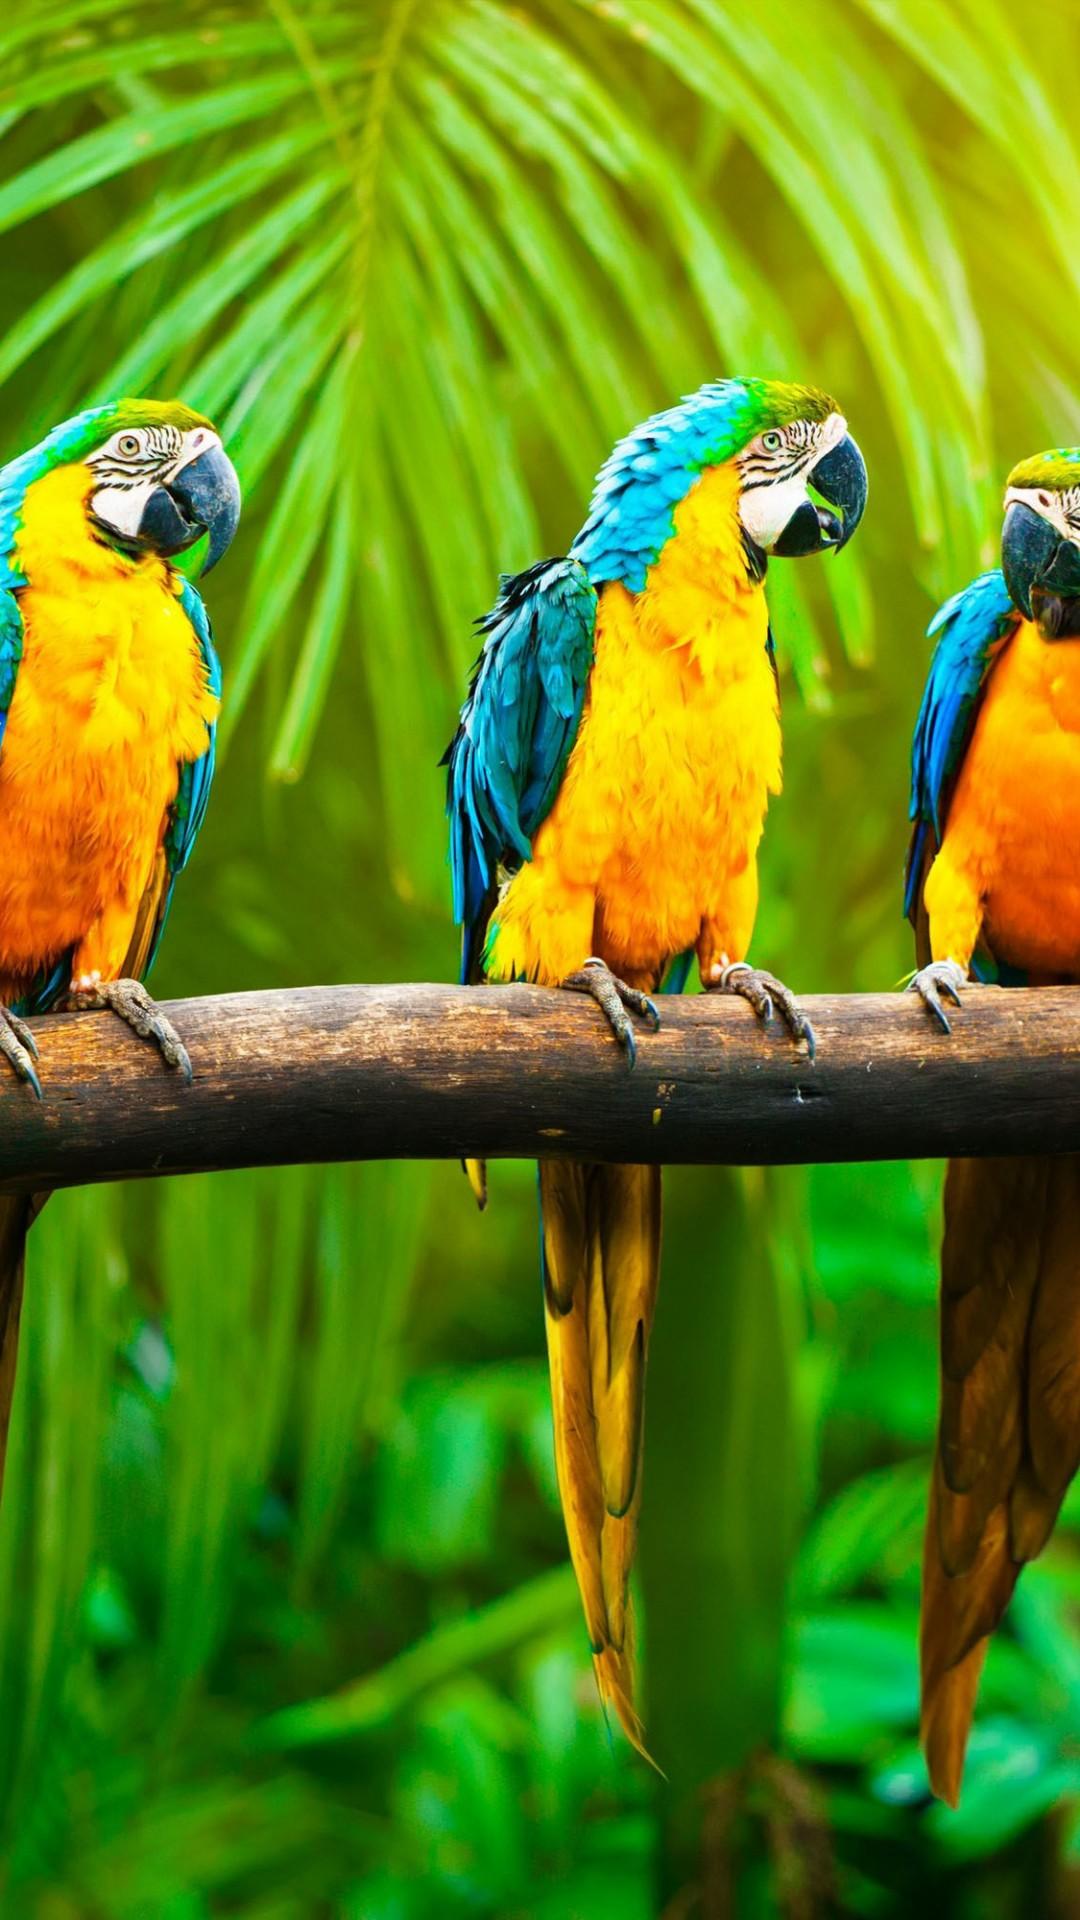 Branch Wallpaper Cute Wallpaper Macaw Parrot Tropics Animals 4566